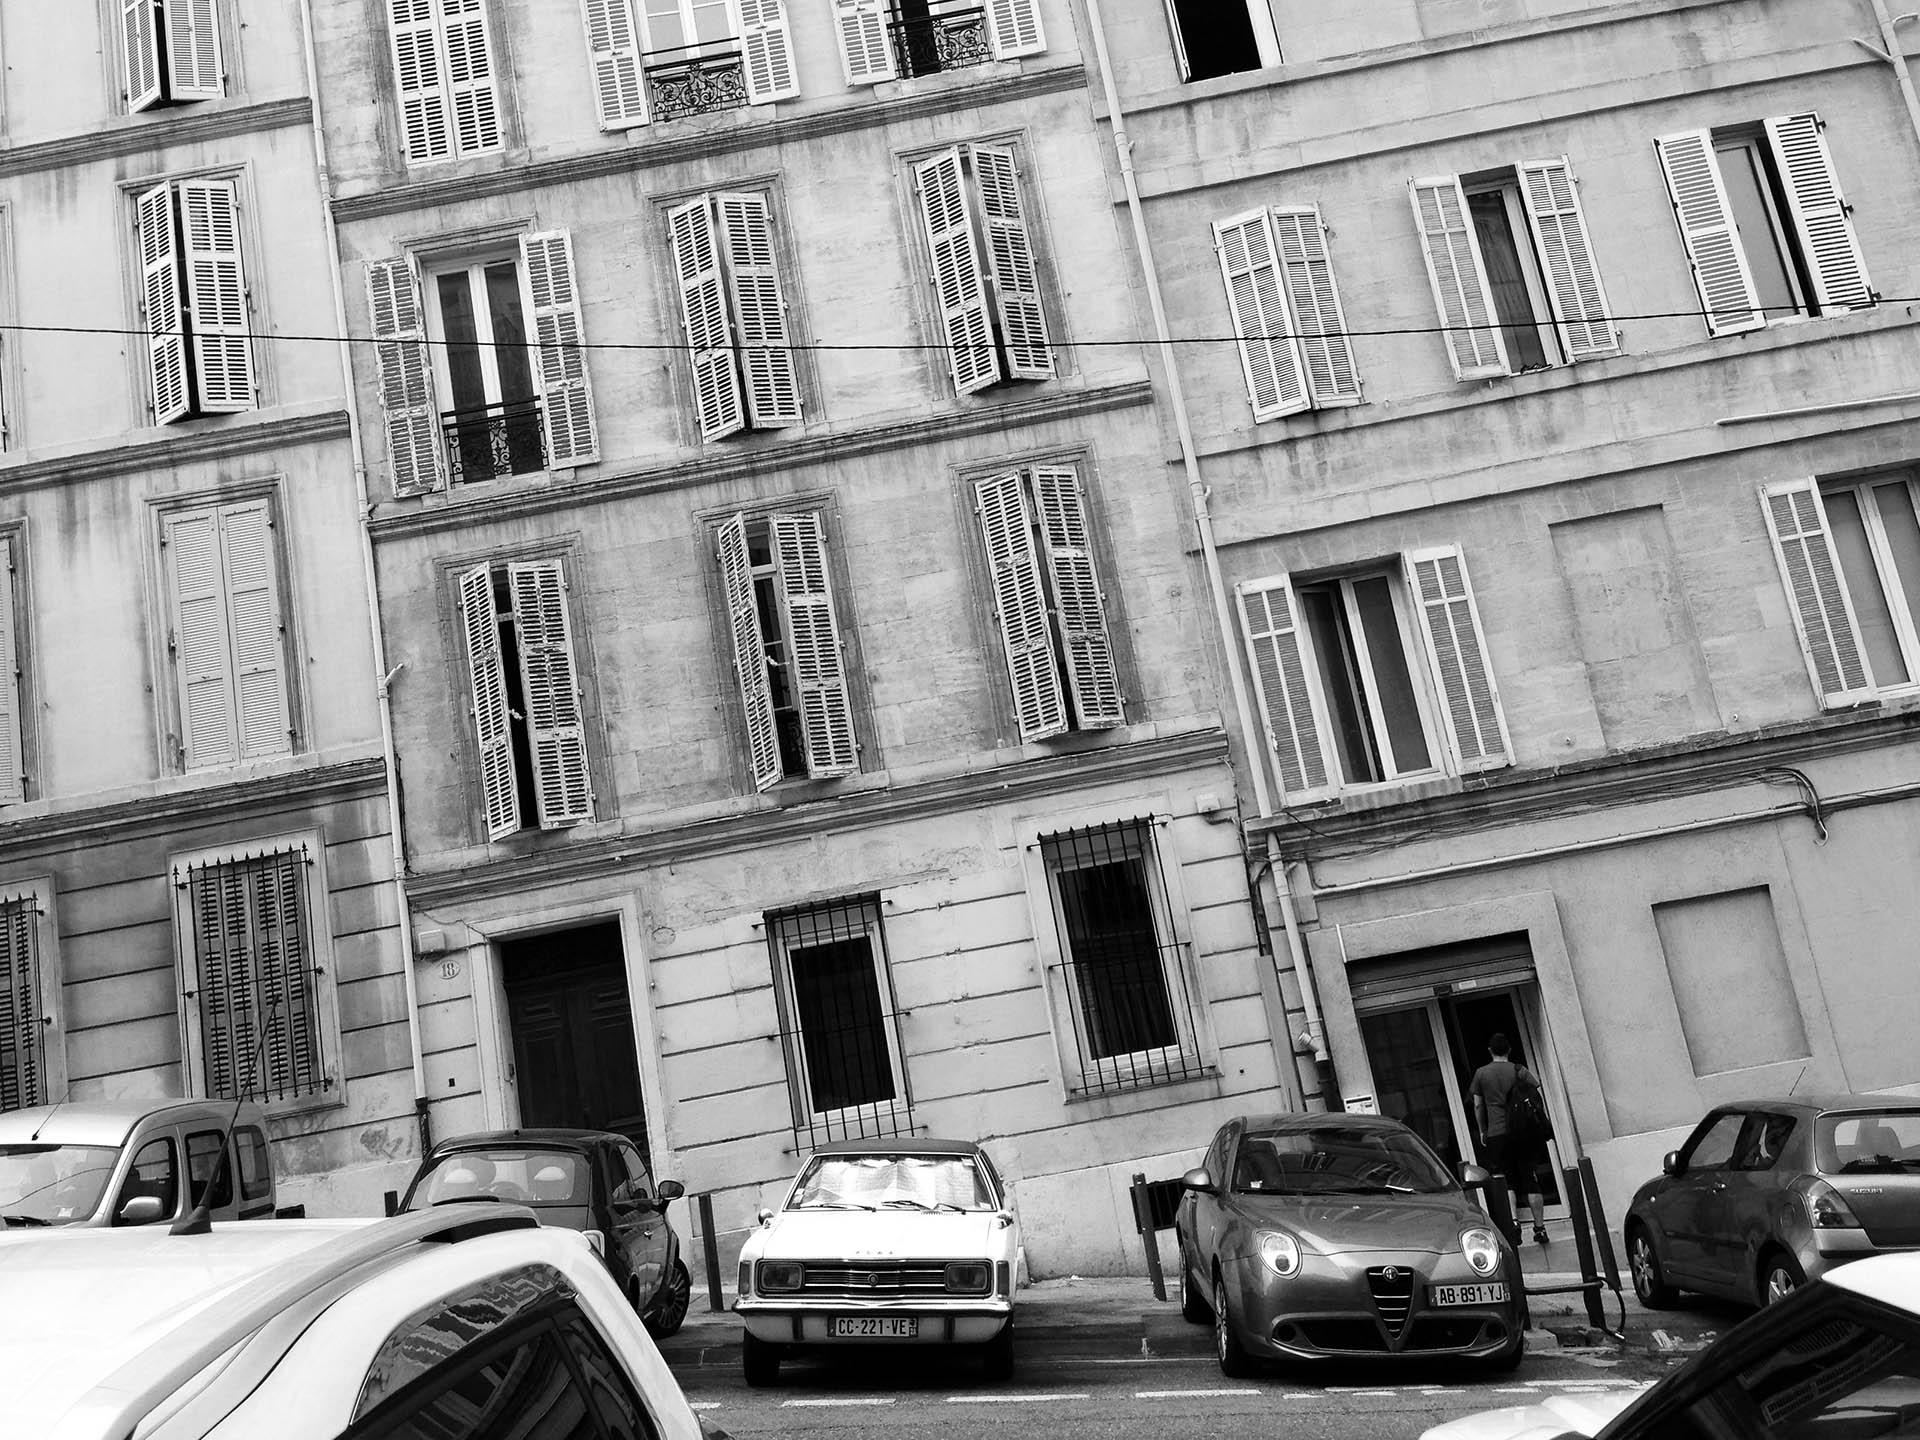 france-marselle_02